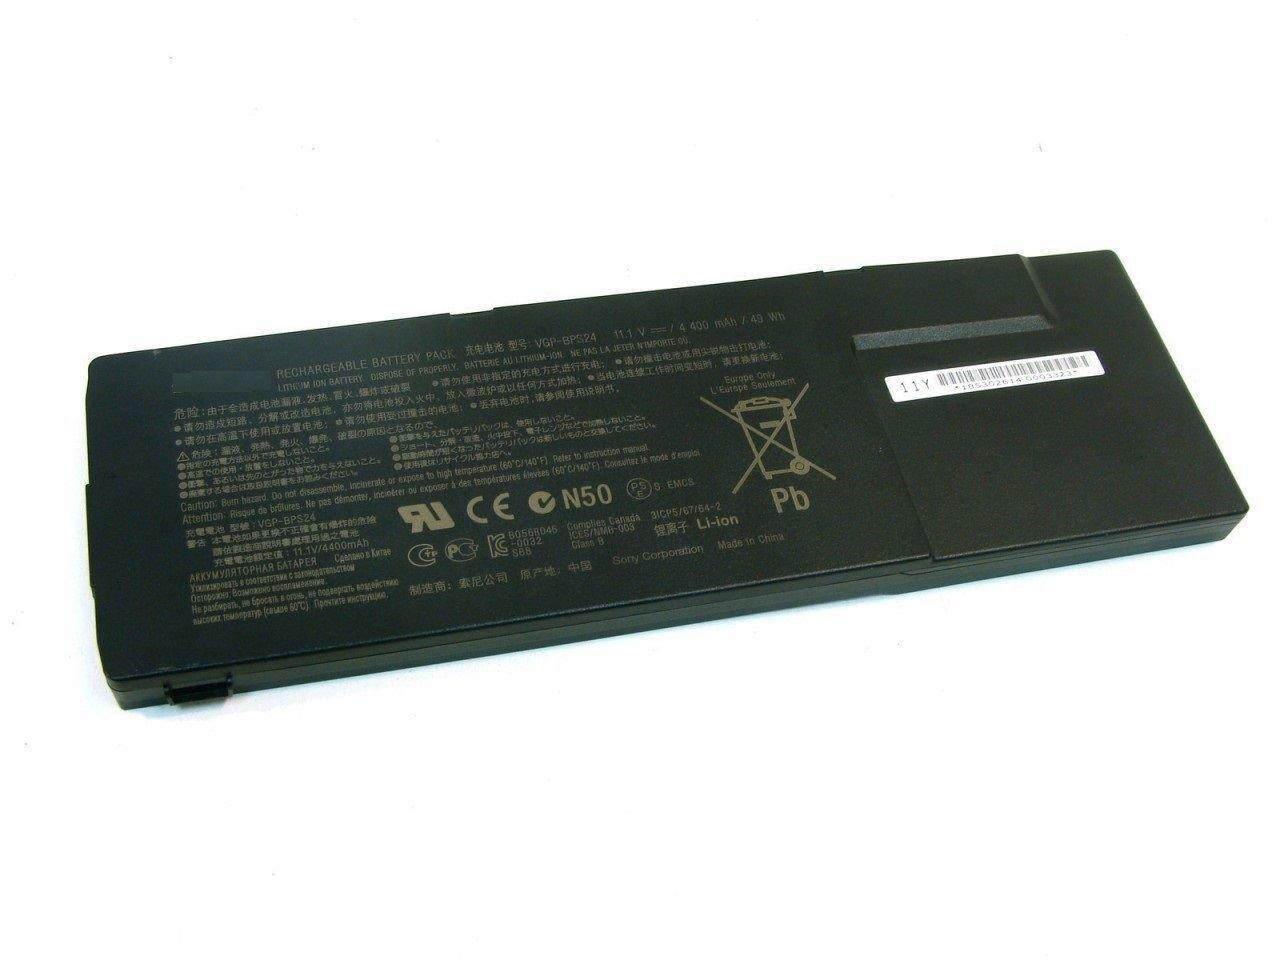 Sony vaio VPC SA SB SC SD SE bps24 series compatible laptop battery